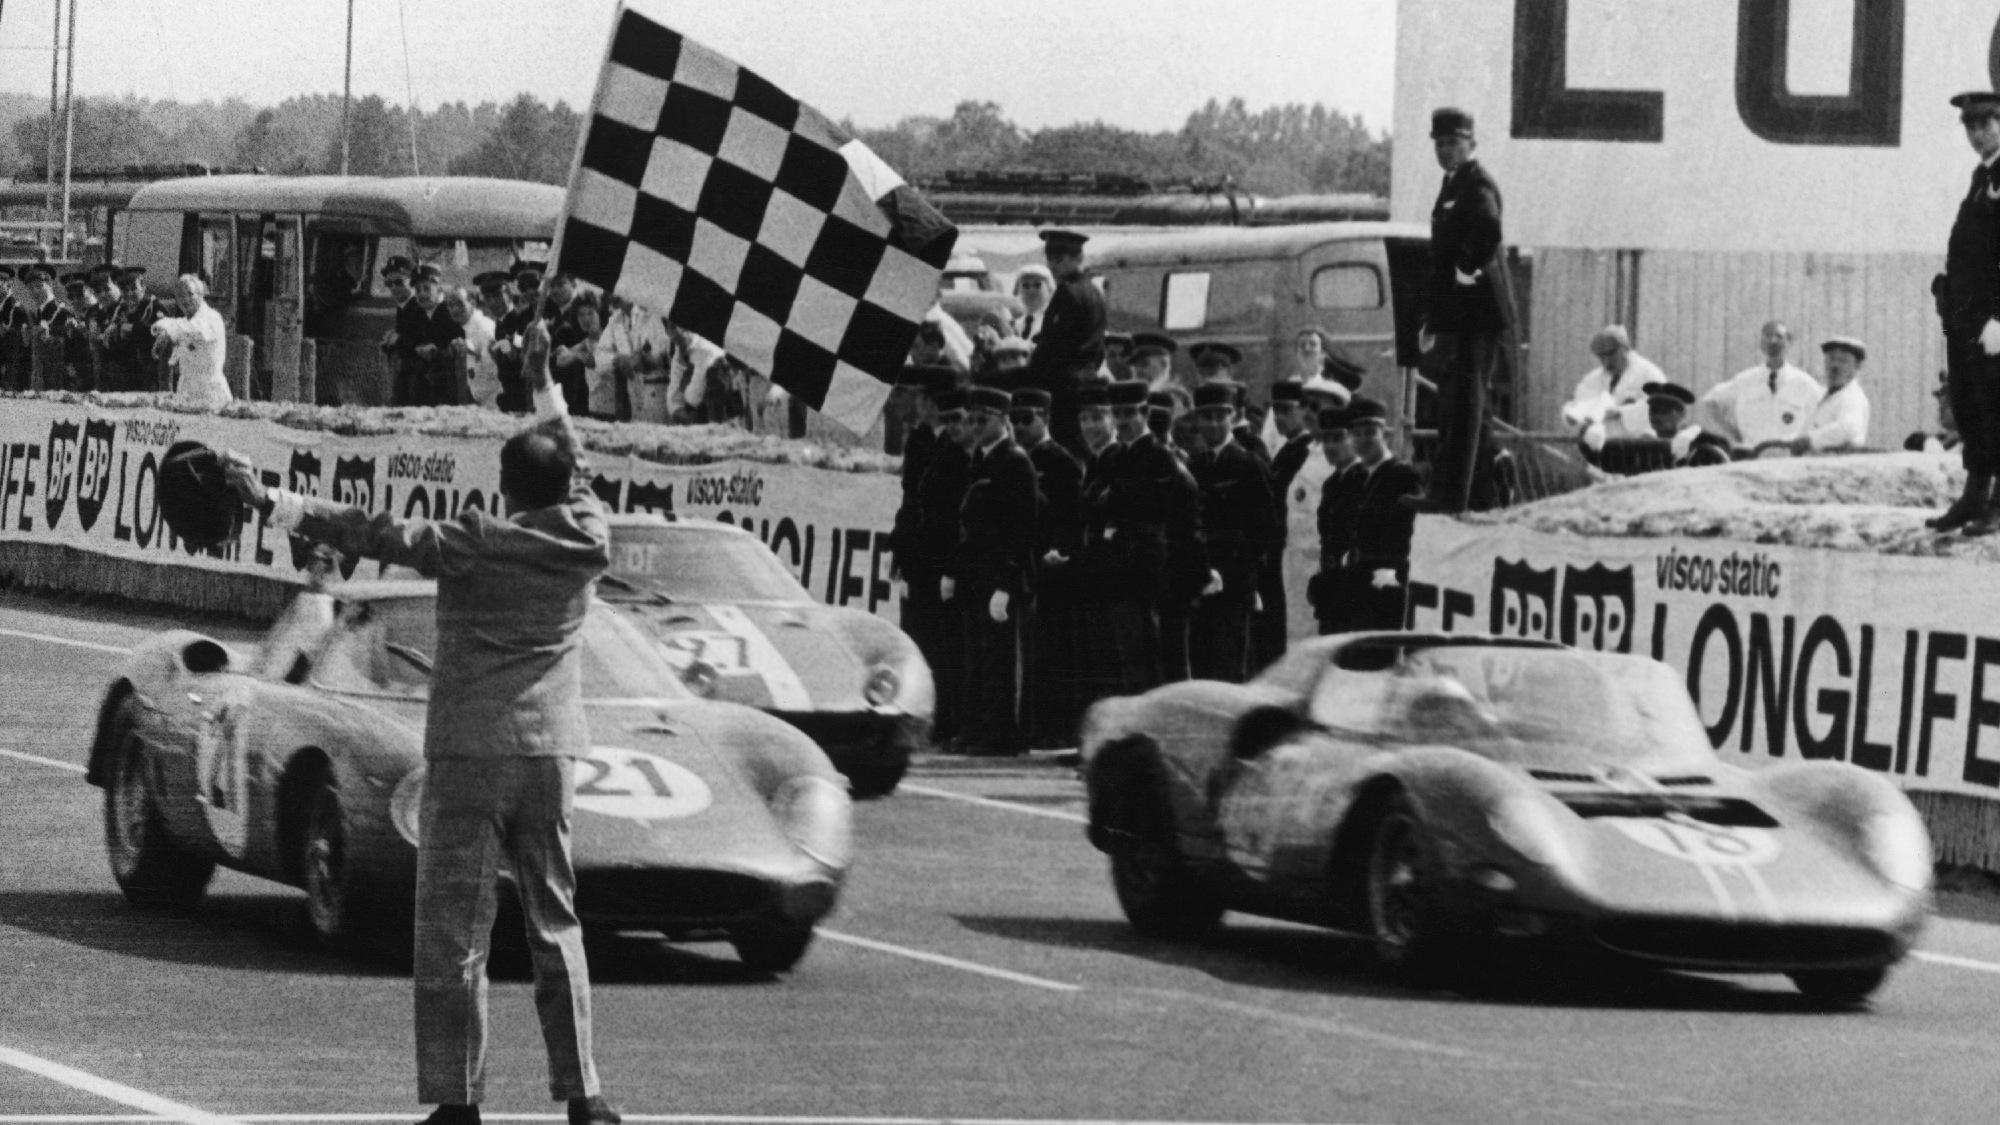 Ferrari Le Mans 1965 win